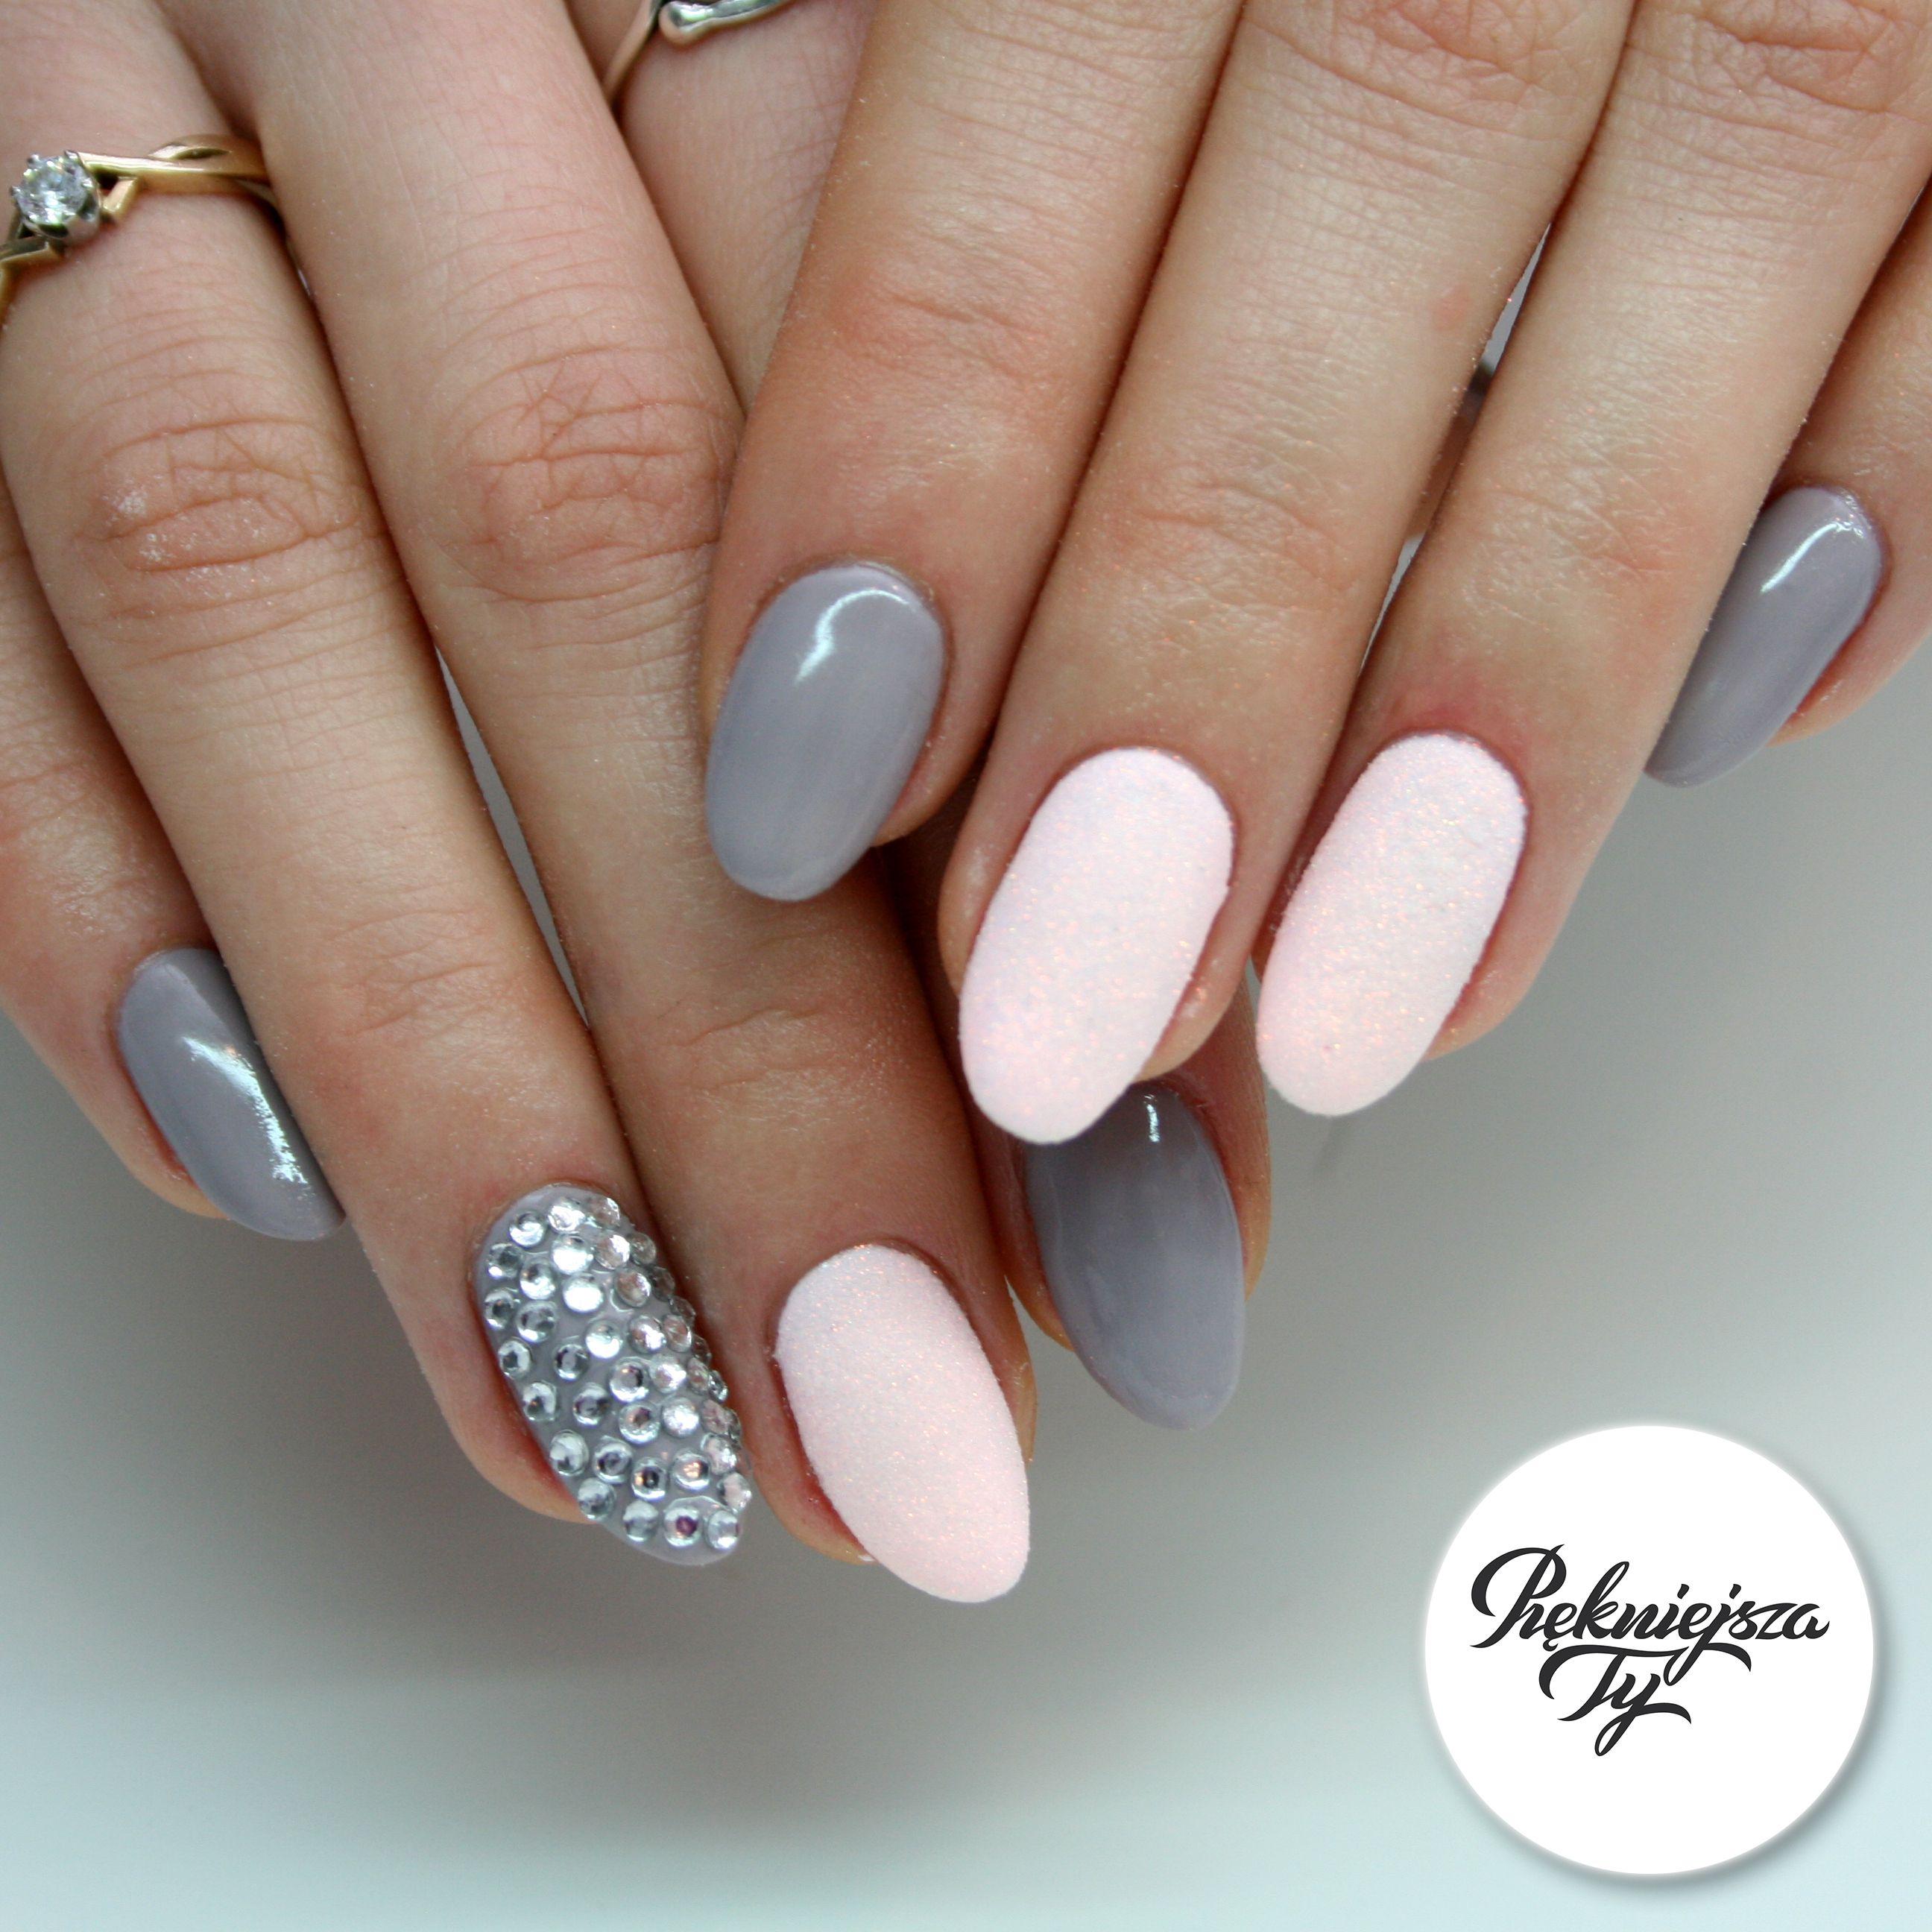 Manicure Hybryda Paznokcie Hybrydowe Hybryda Paznokcie Nails